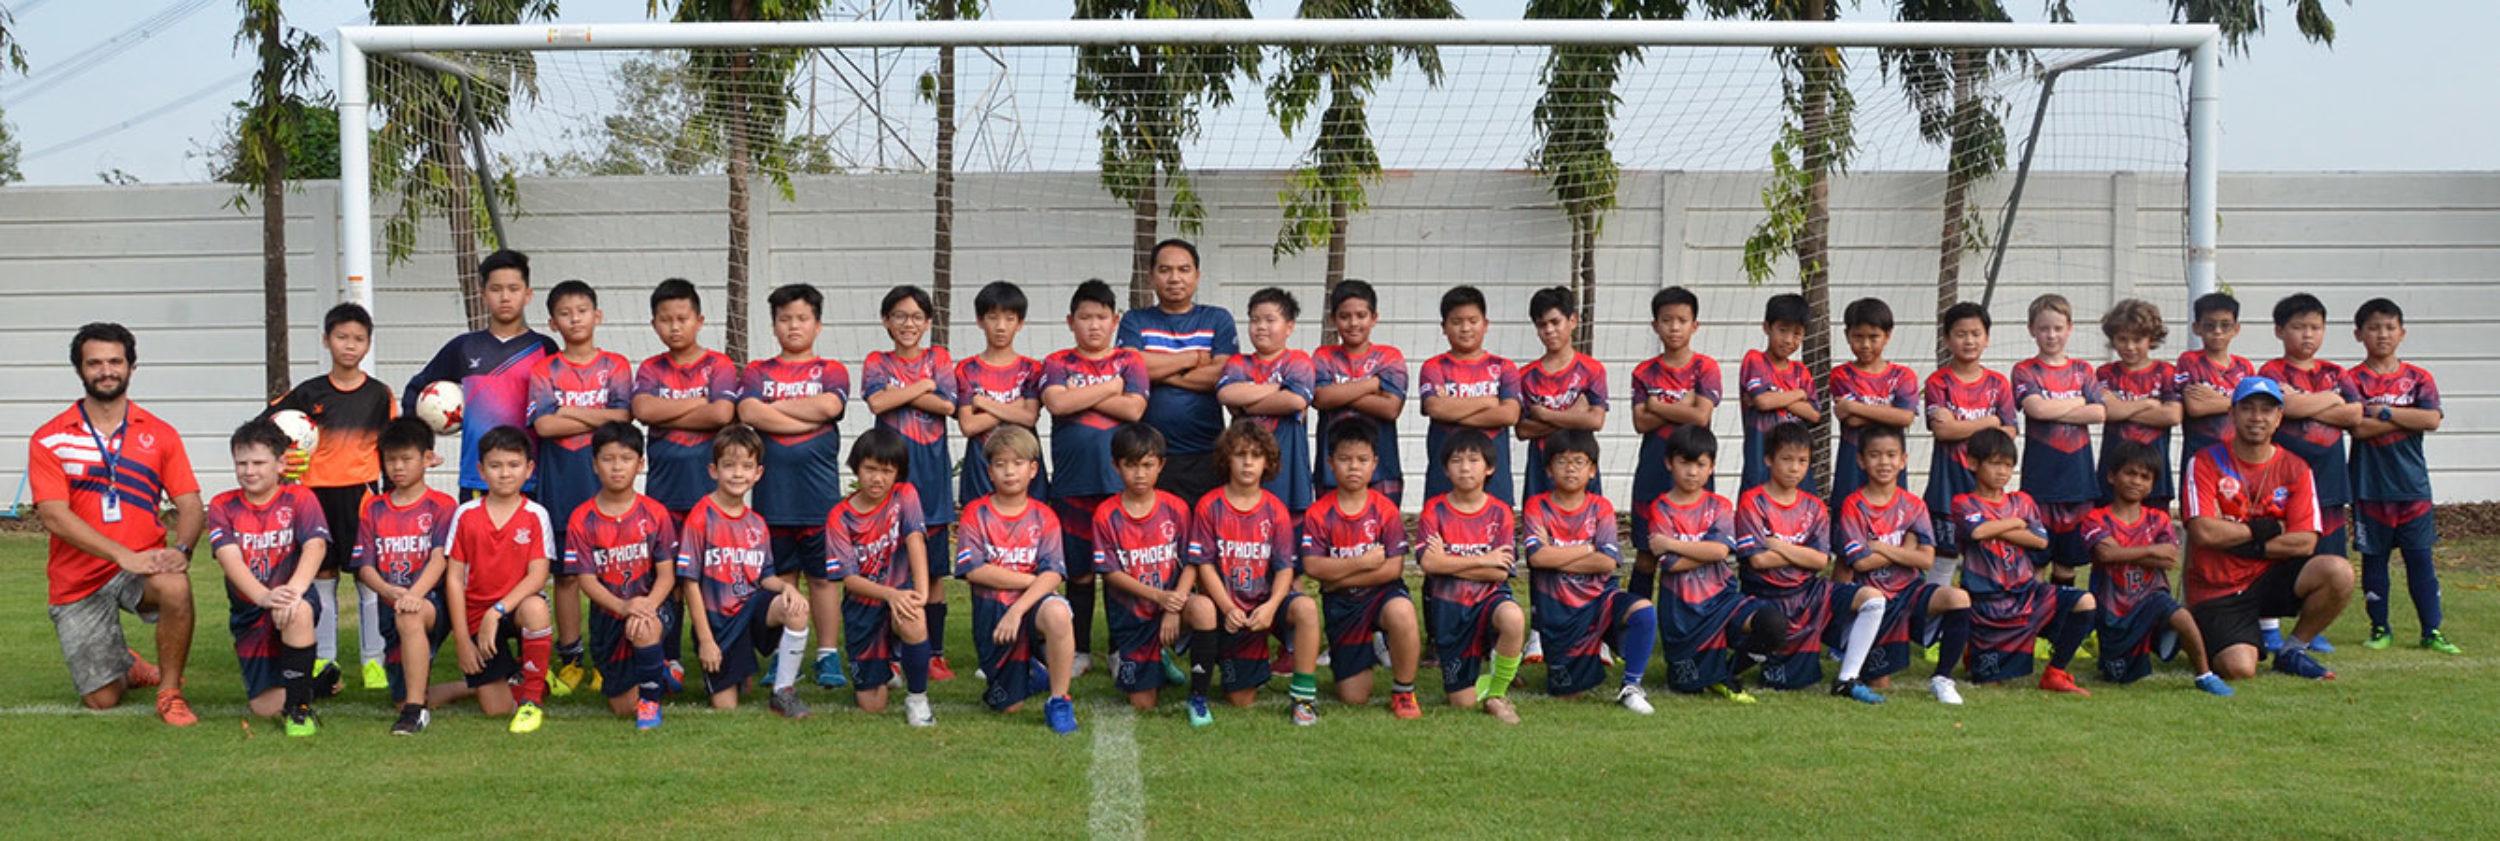 U11 Boys Soccer